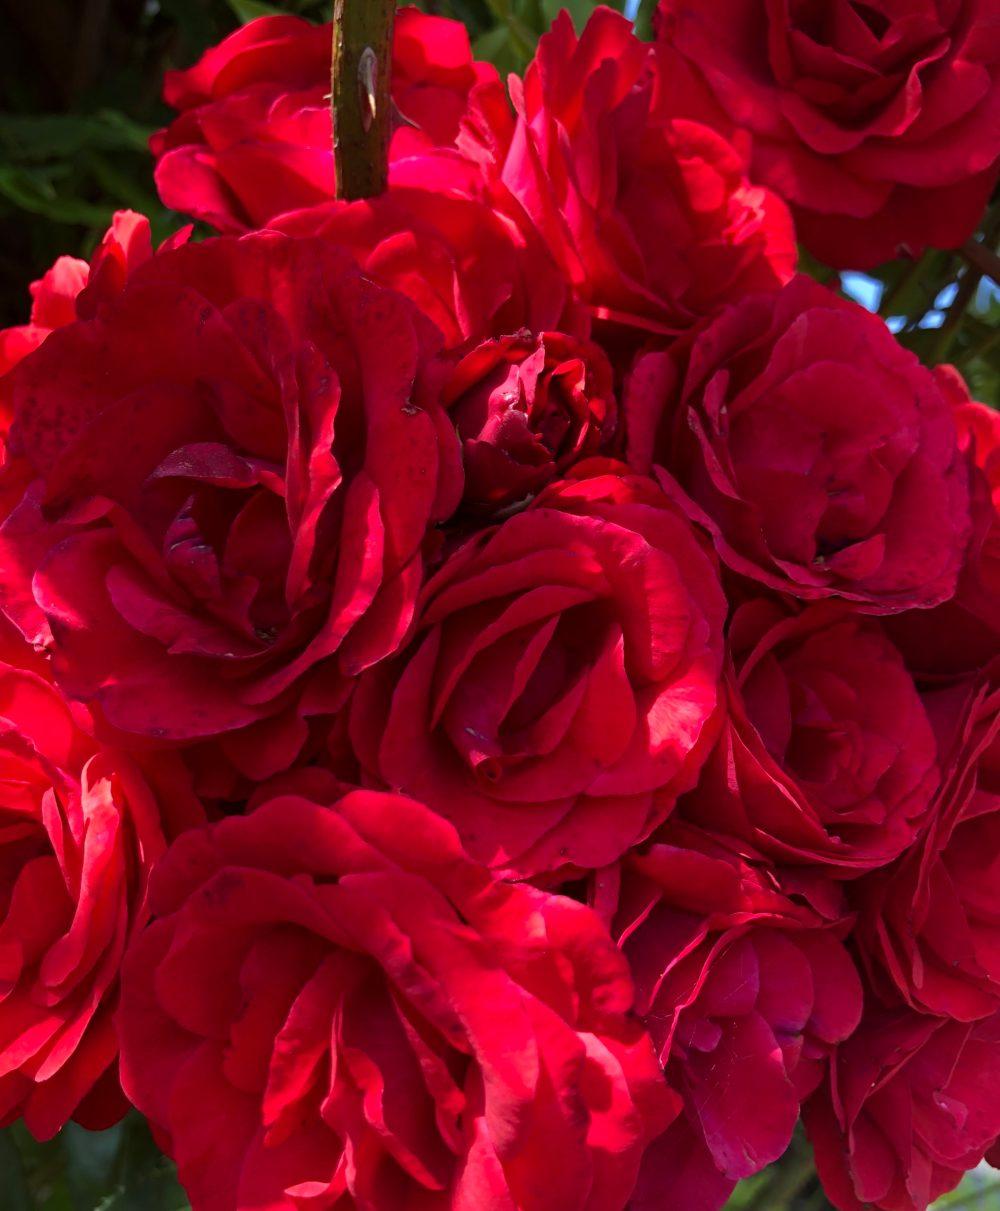 Viele rote Rosen